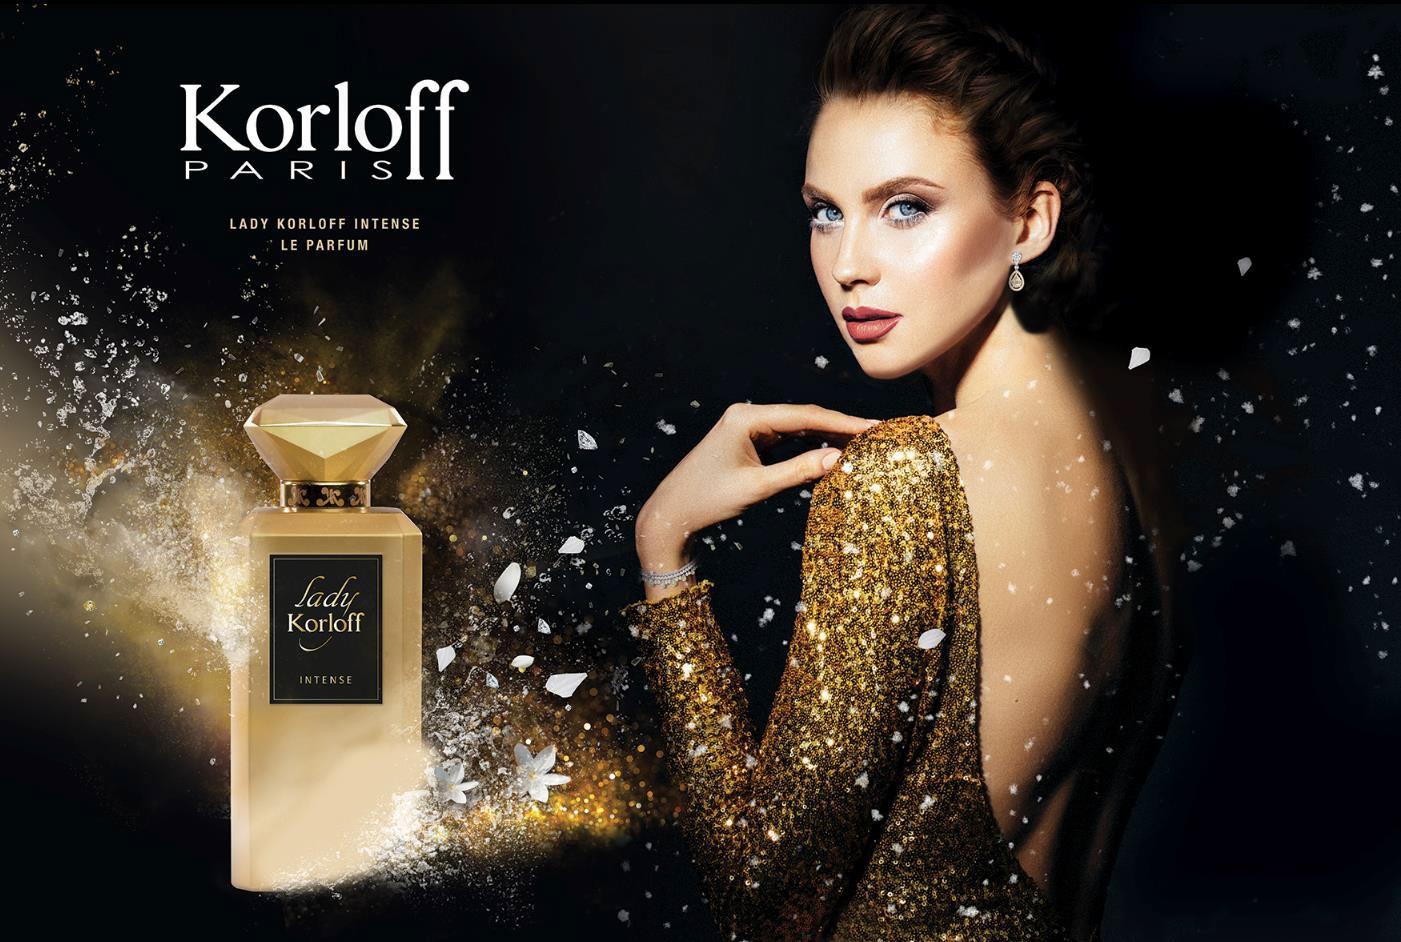 Lady Korloff Intense Perfume